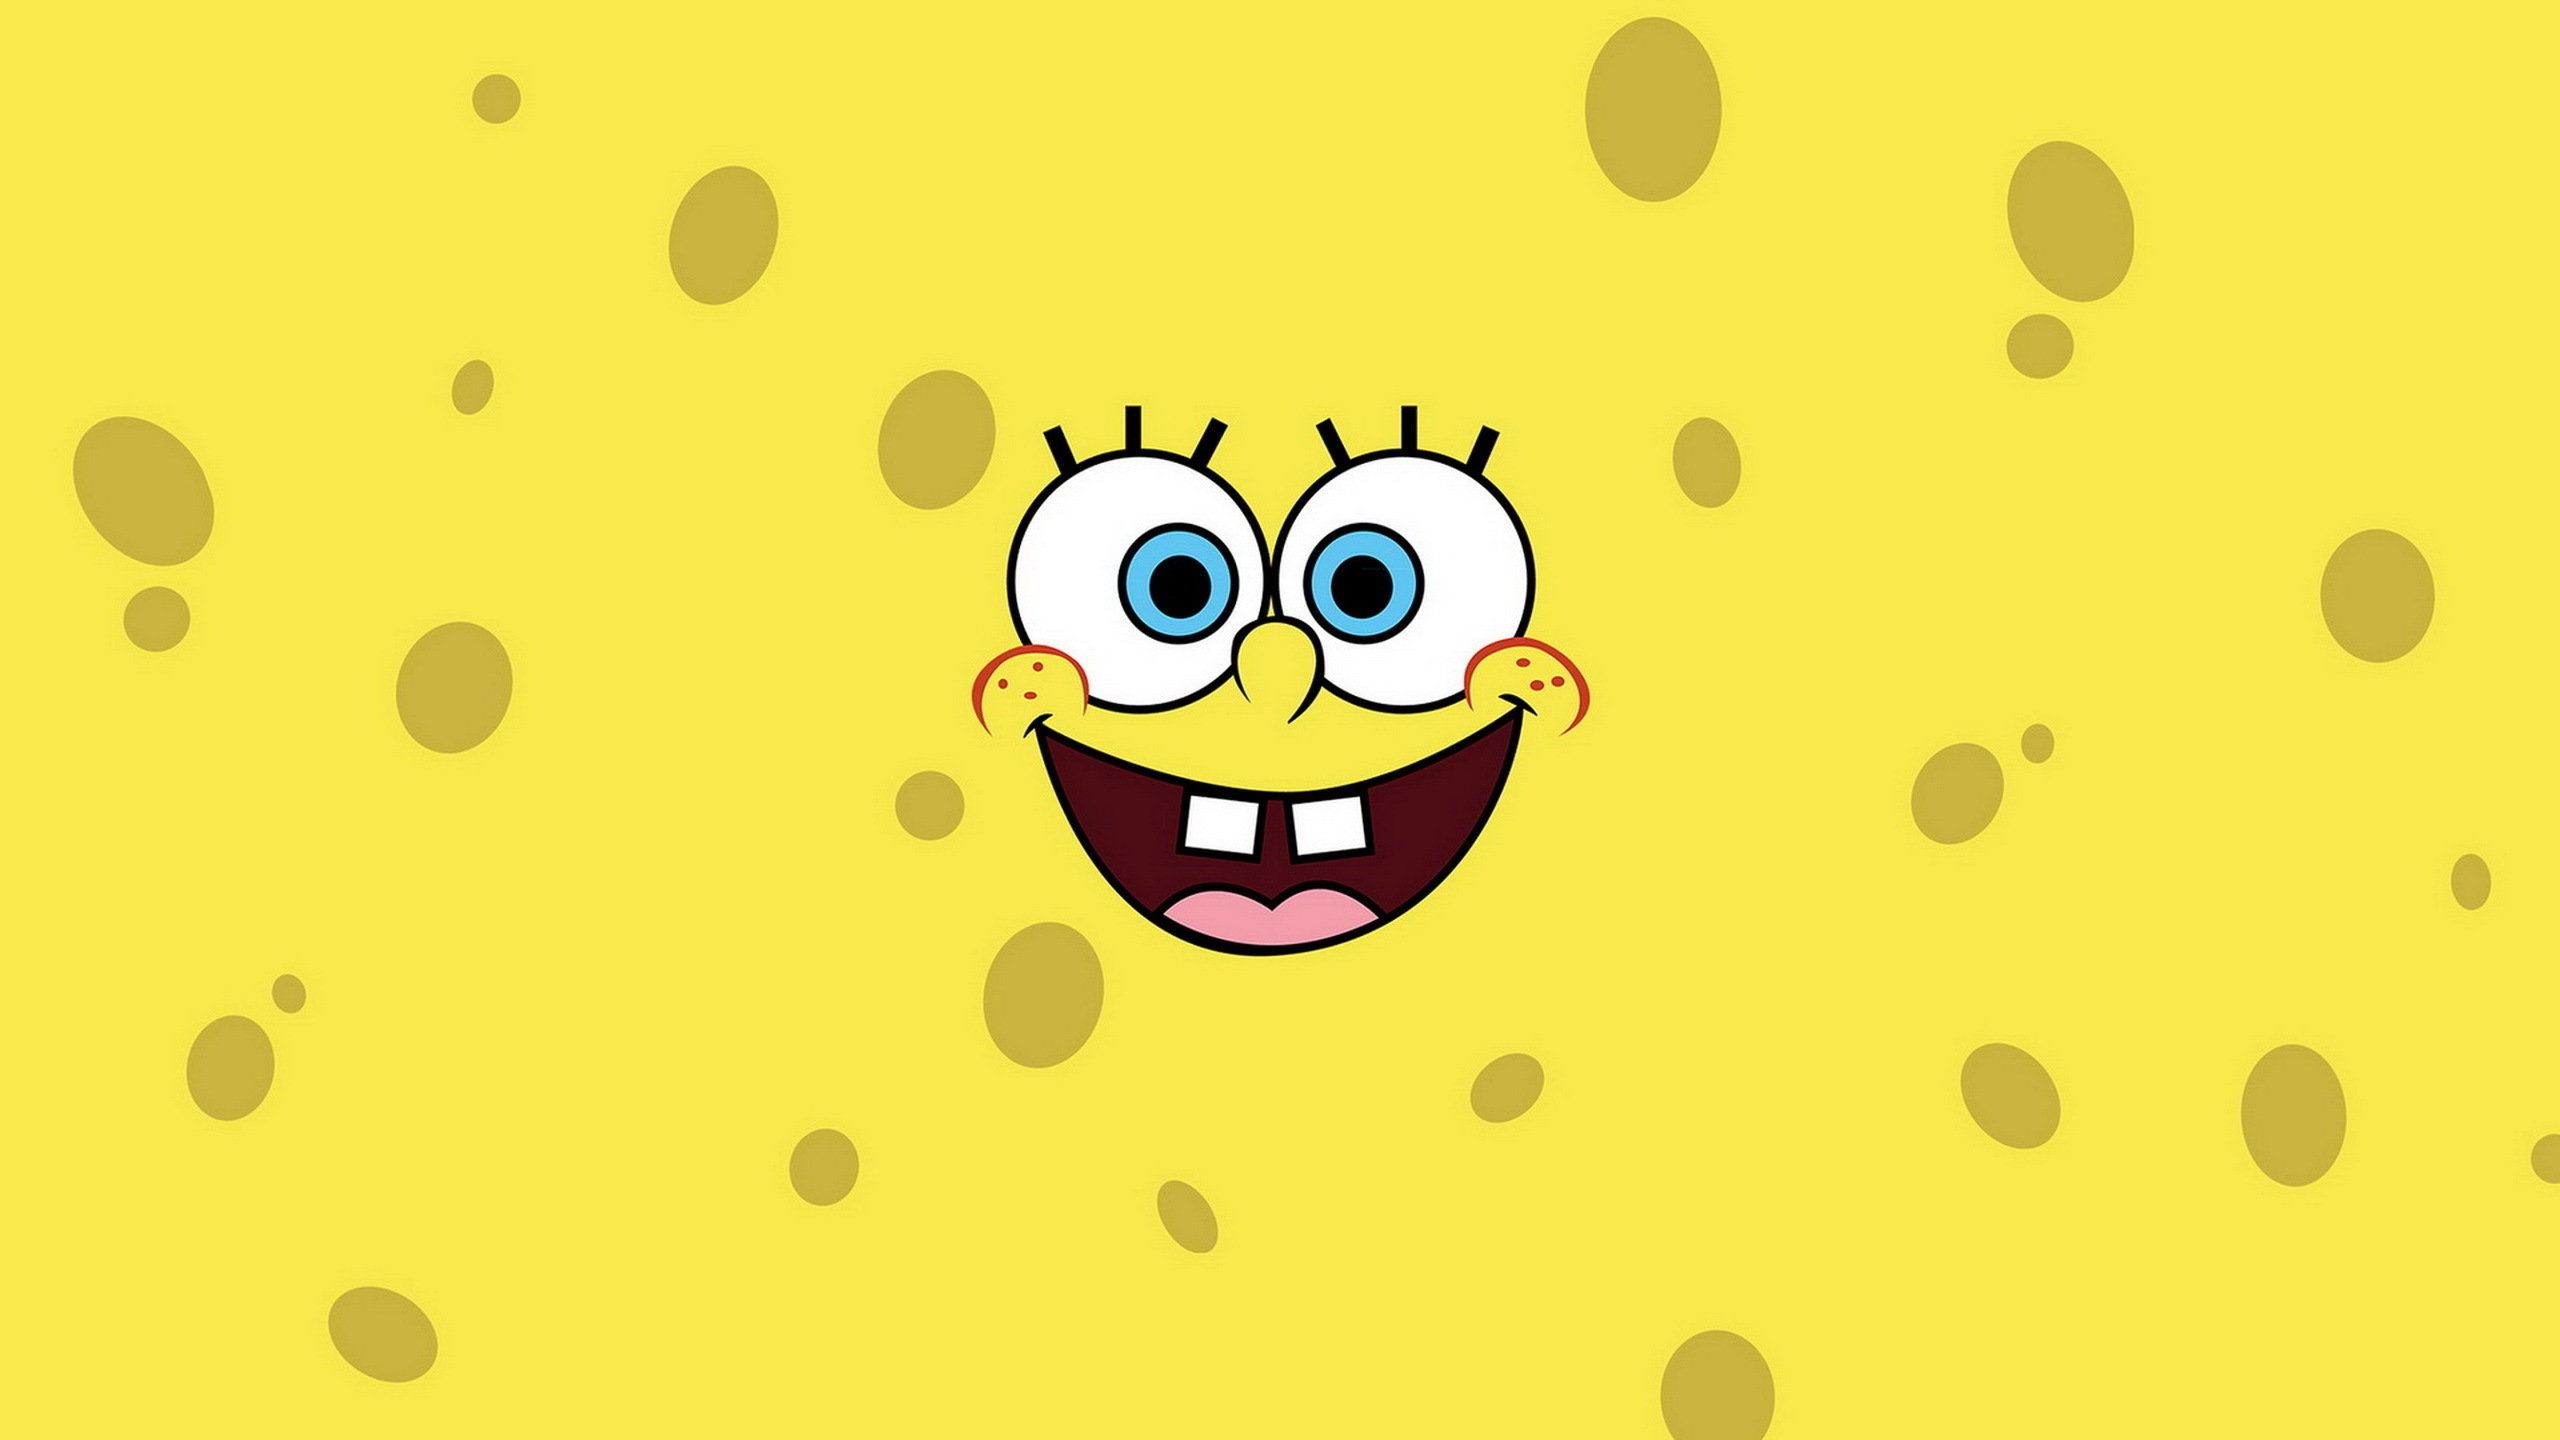 Spongebob Wallpapers Hd: Spongebob Squarepants Wallpapers, Pictures, Images